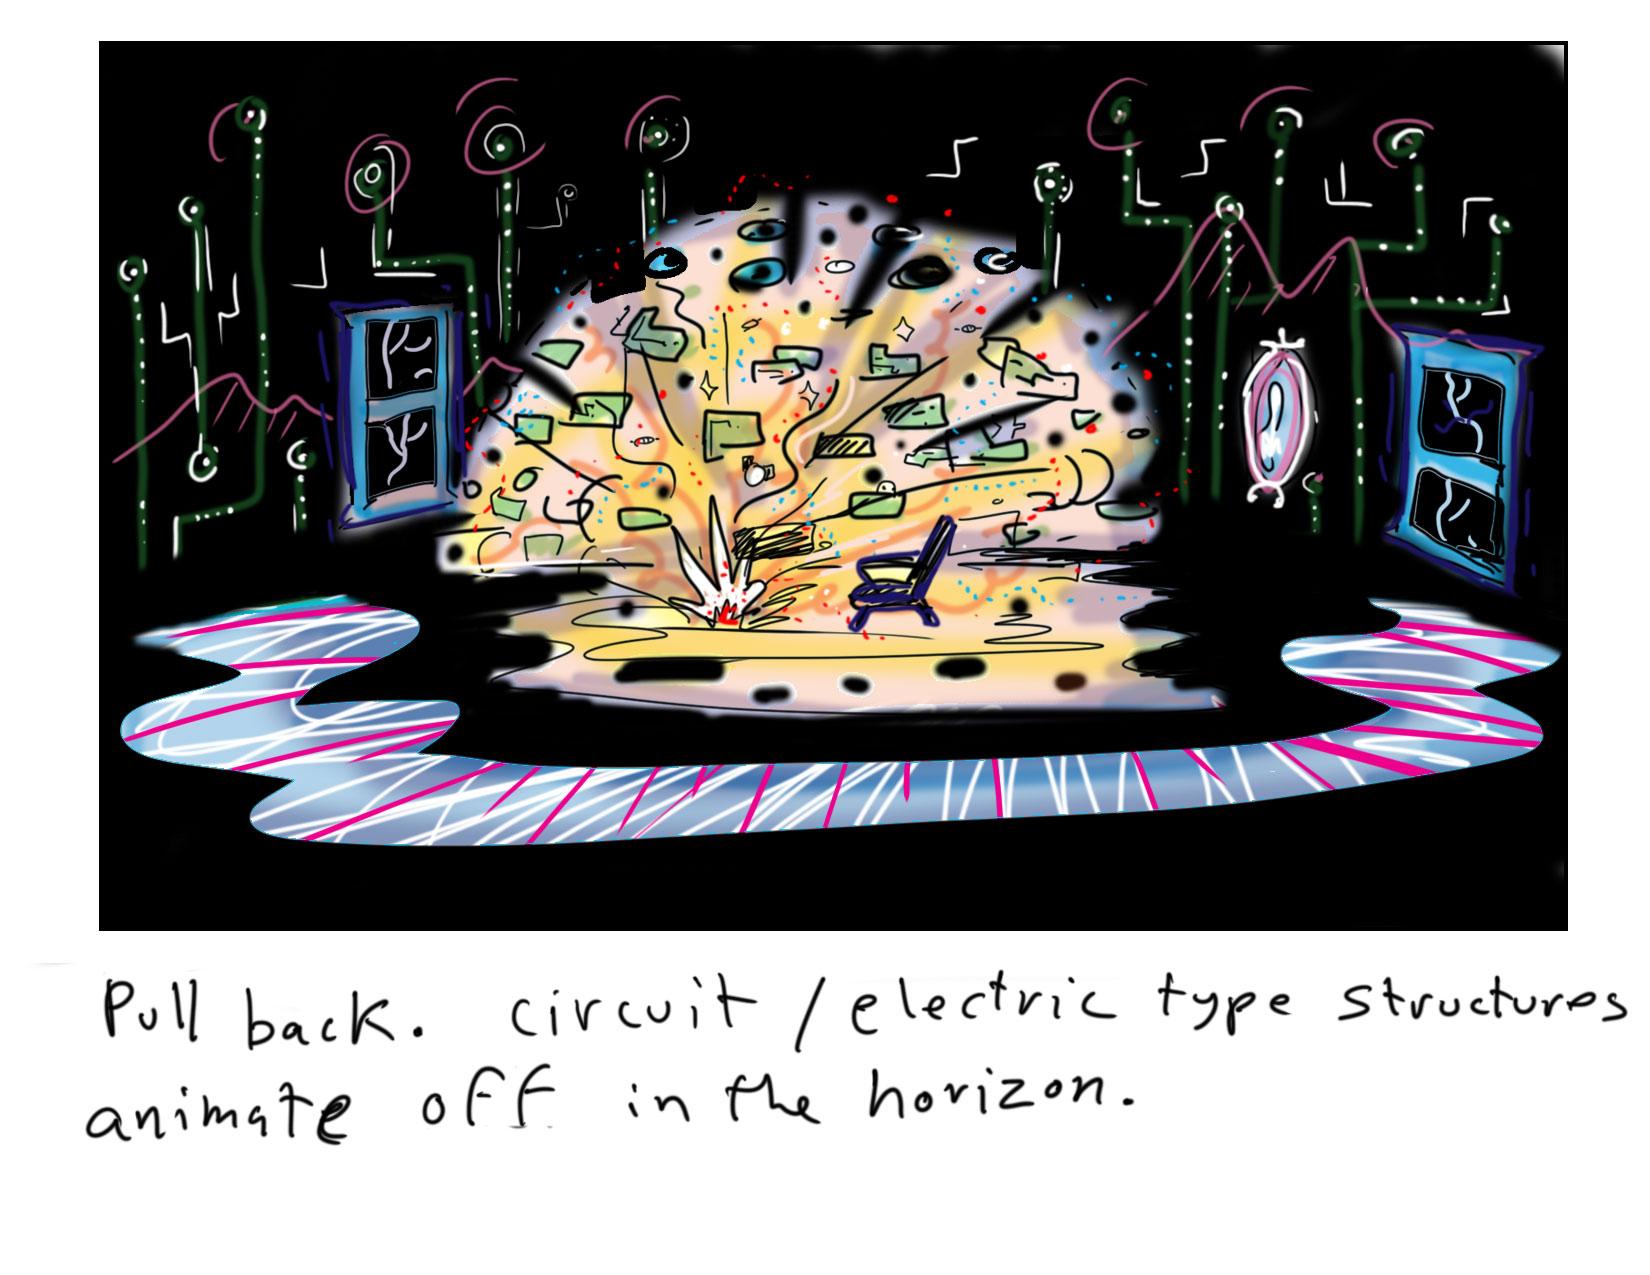 CircuitStory_Slide11